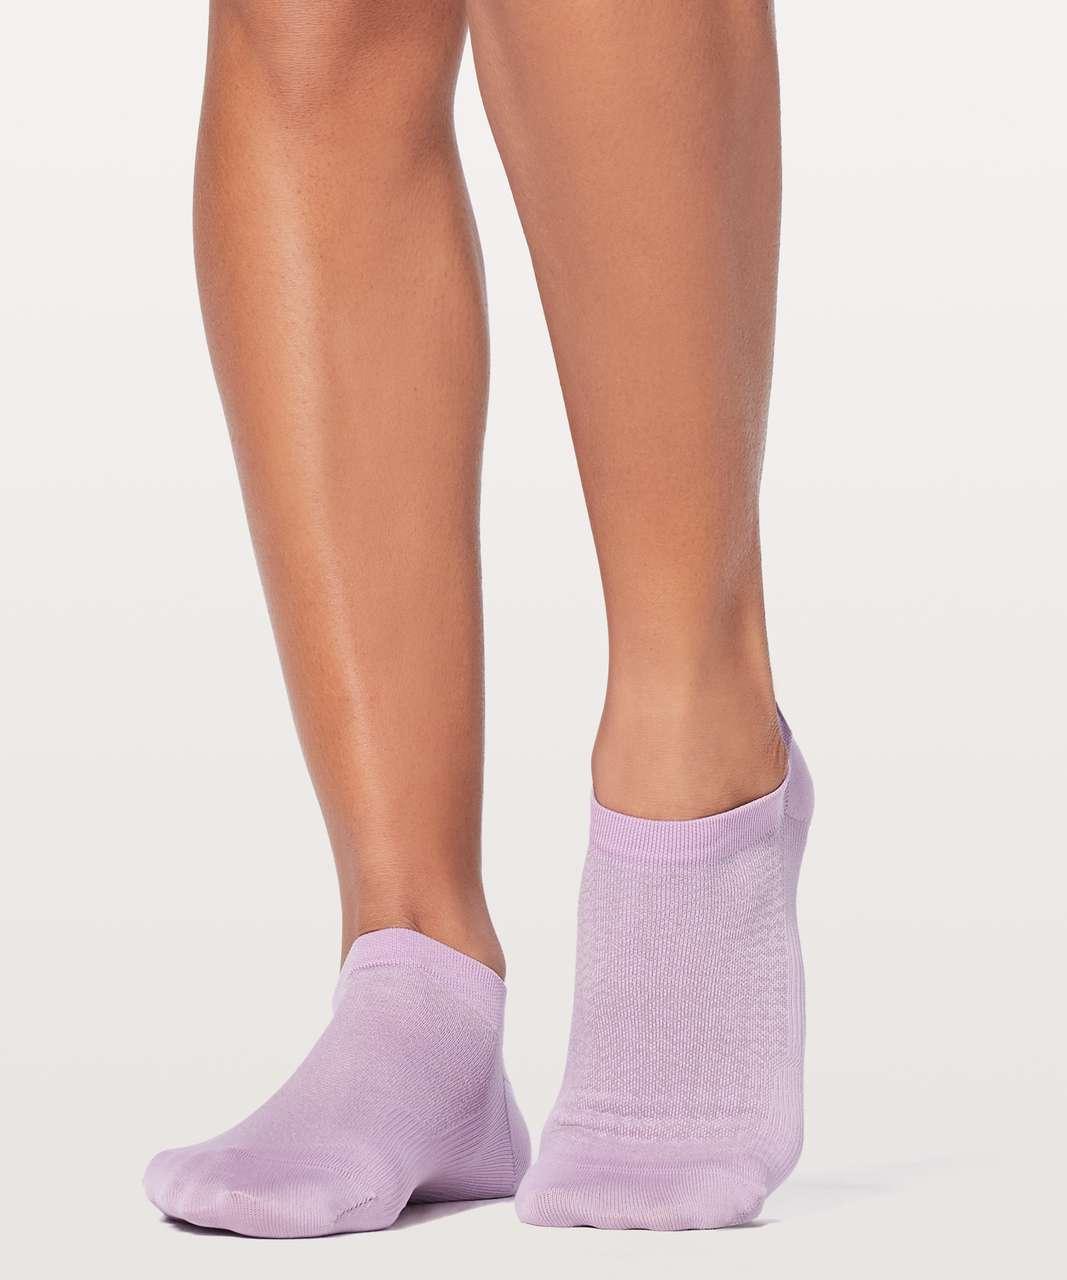 Lululemon Light Speed Sock Silver - Lilac Quartz / Rose Quartz